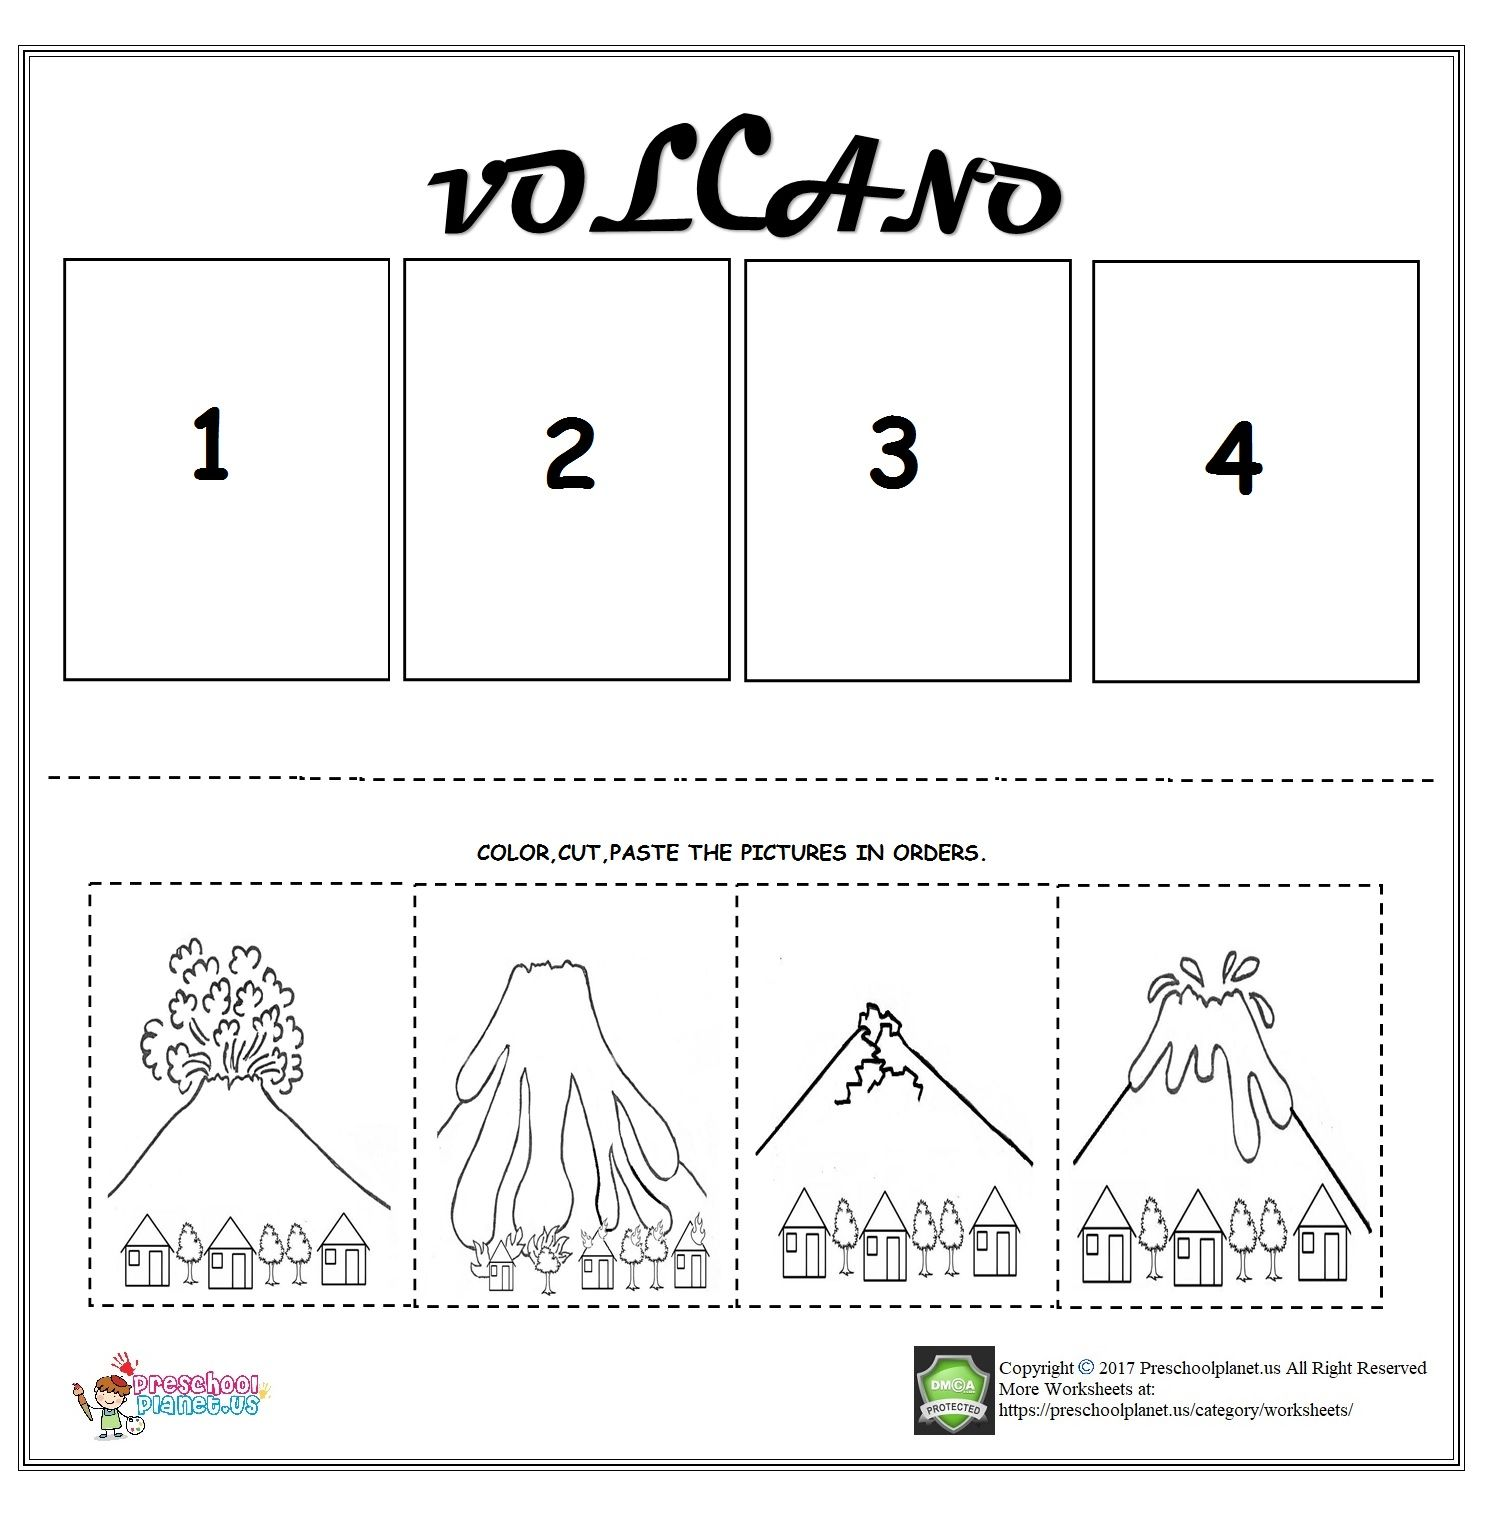 small resolution of Volcano sequencing worksheet for kids   Kindergarten sequencing worksheets